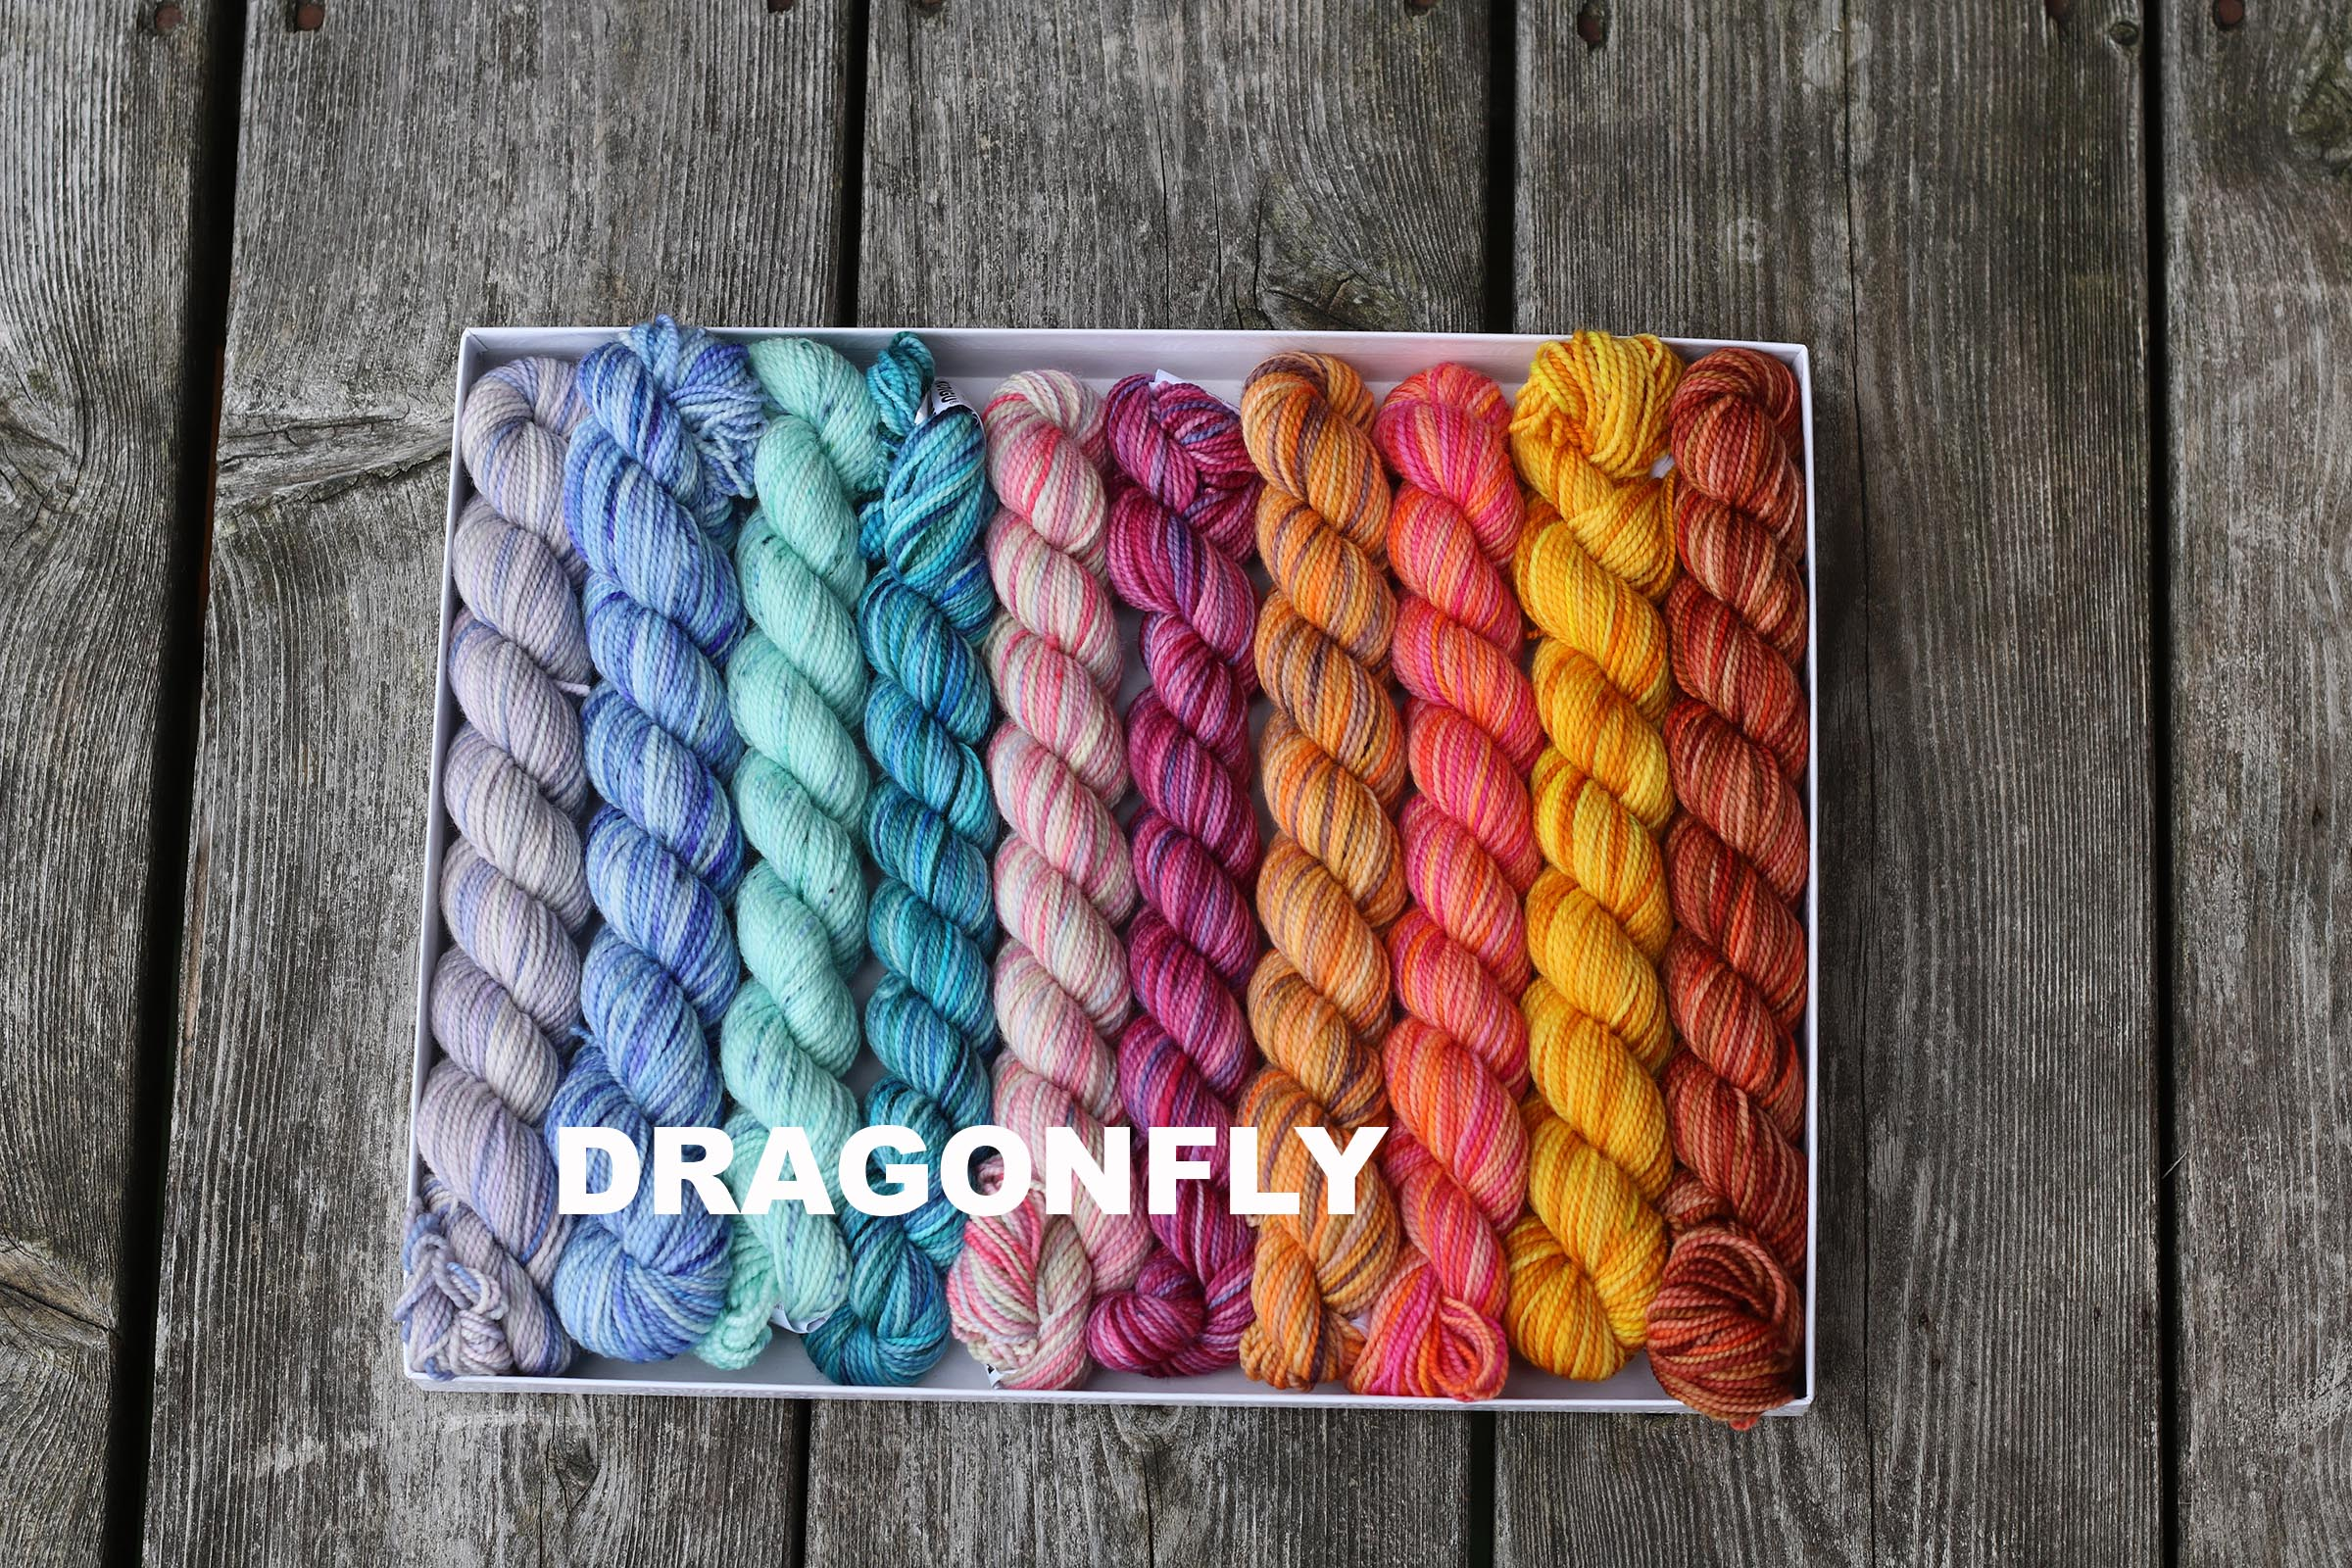 DRAGONFLYIMG_0920.jpg